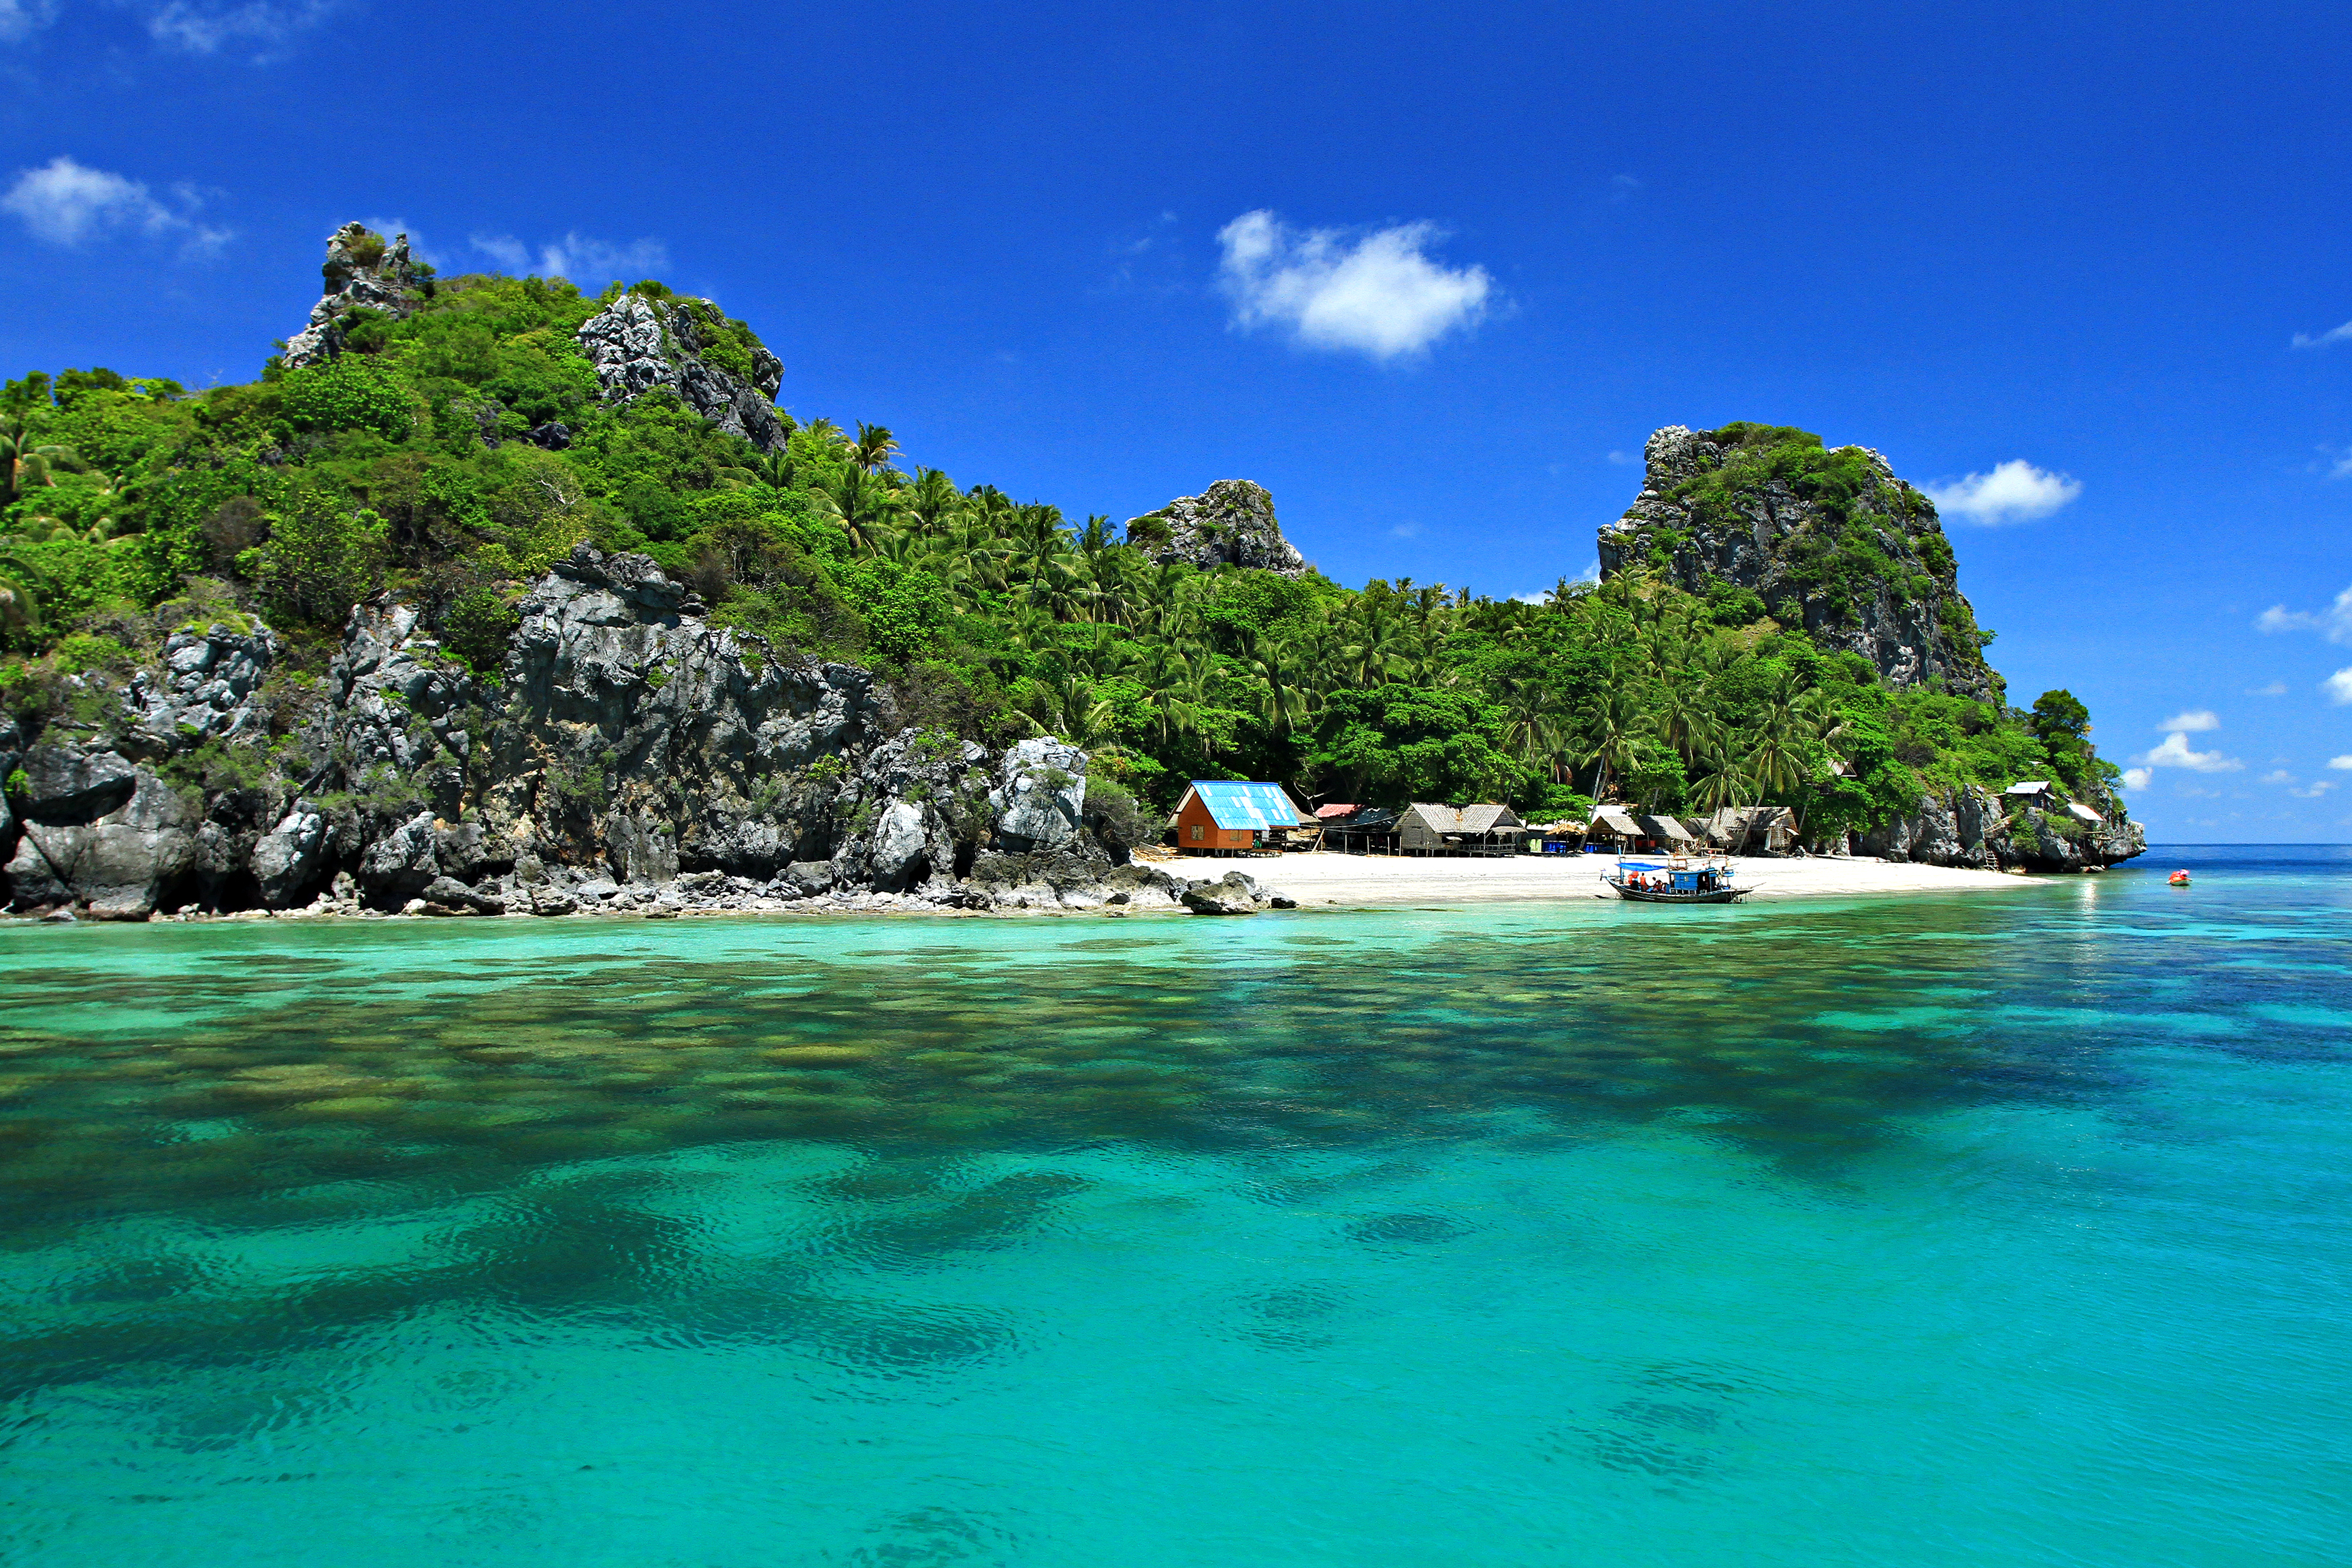 Islands Camping Resort Lansdowne On Ke L